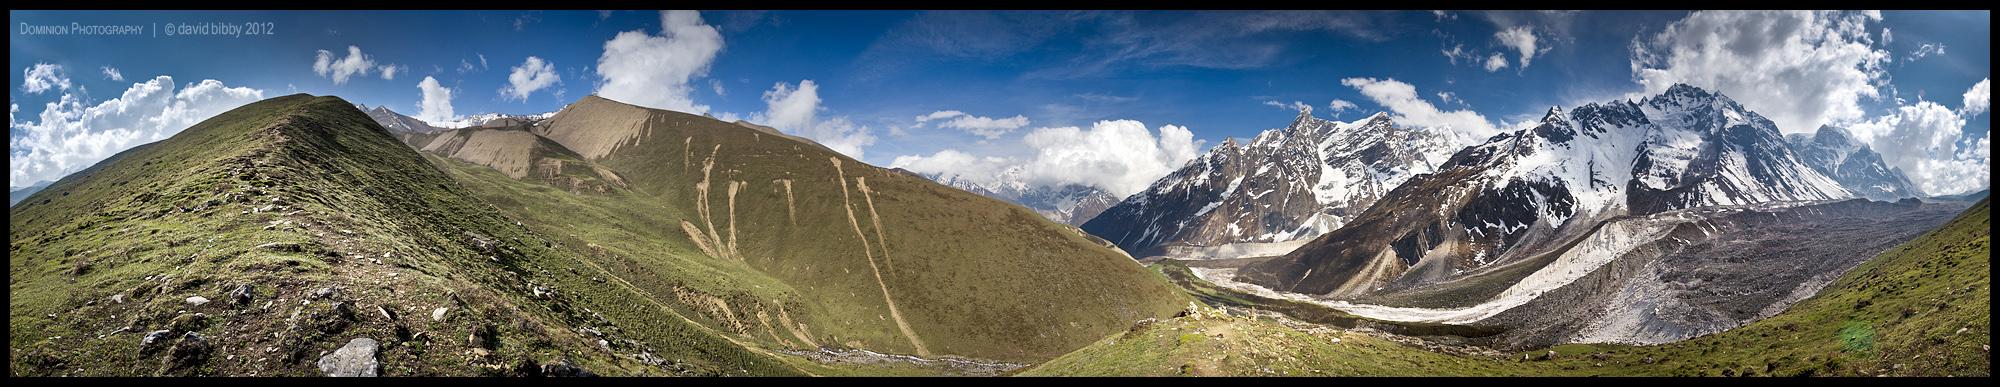 Larkya Himal by Dominion-Photography